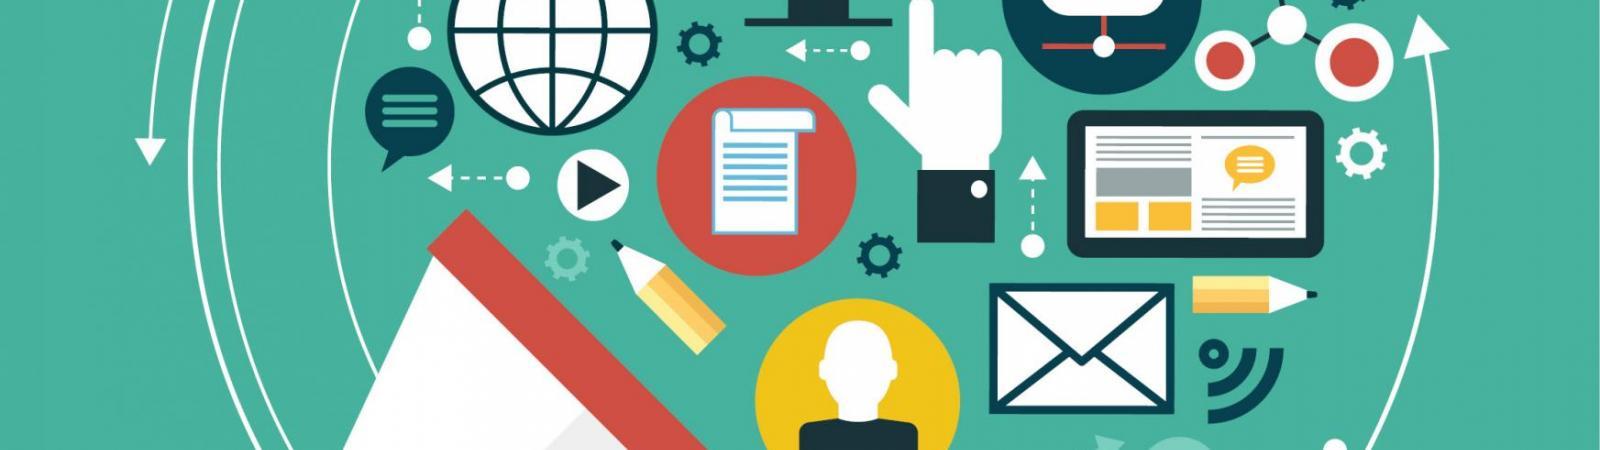 digital communications graphic